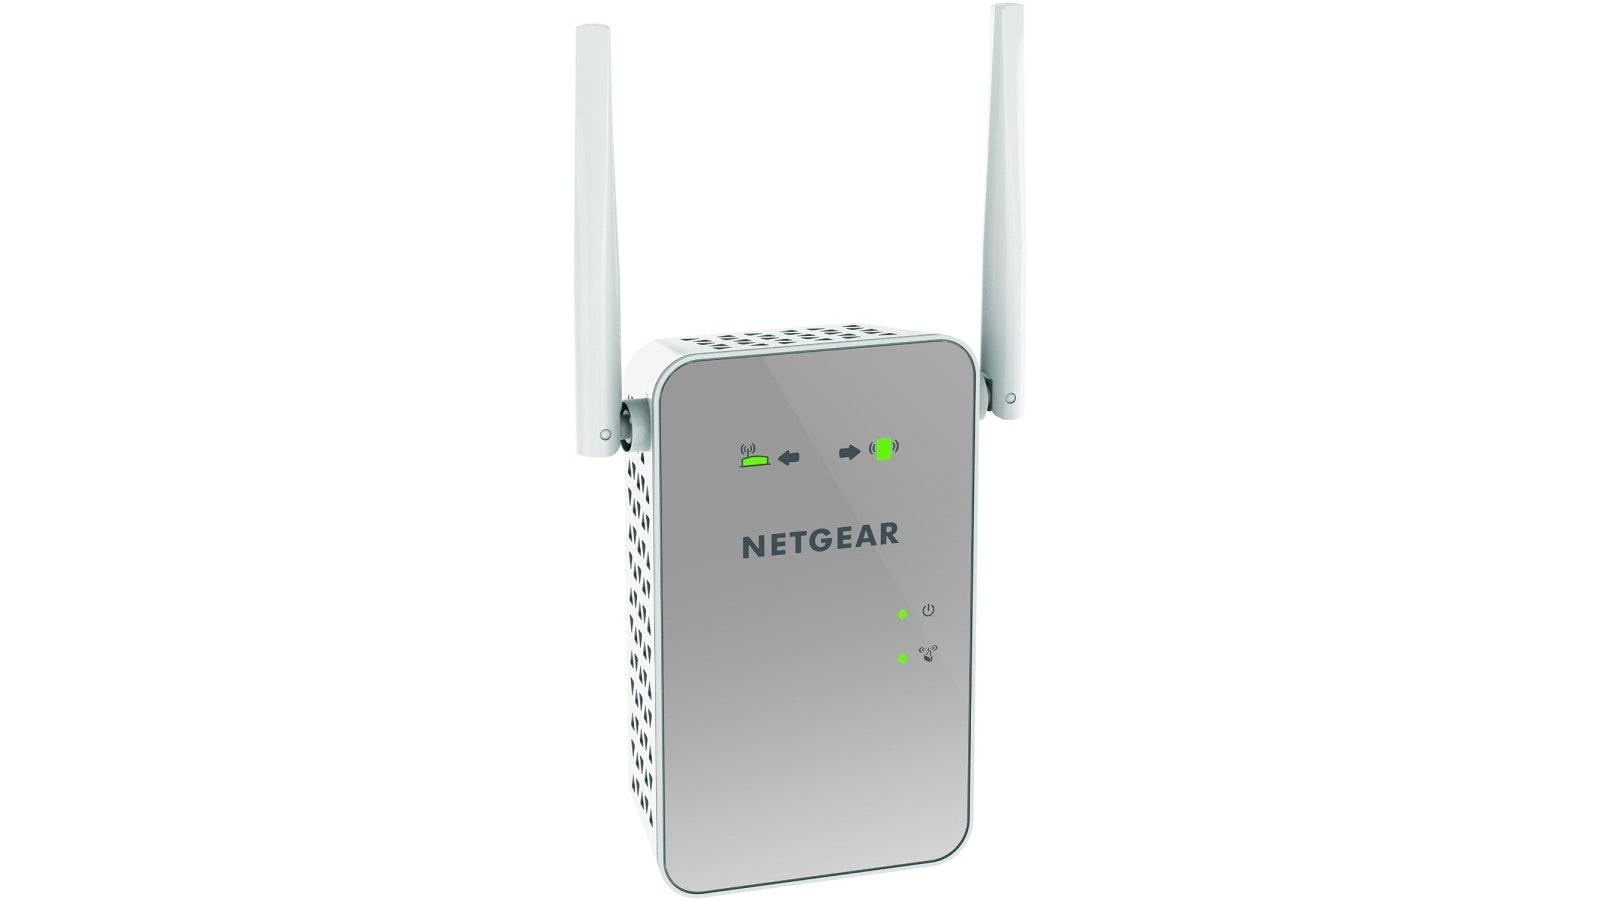 netgear ex6150 ac1200 wifi range extender harvey norman new zealand